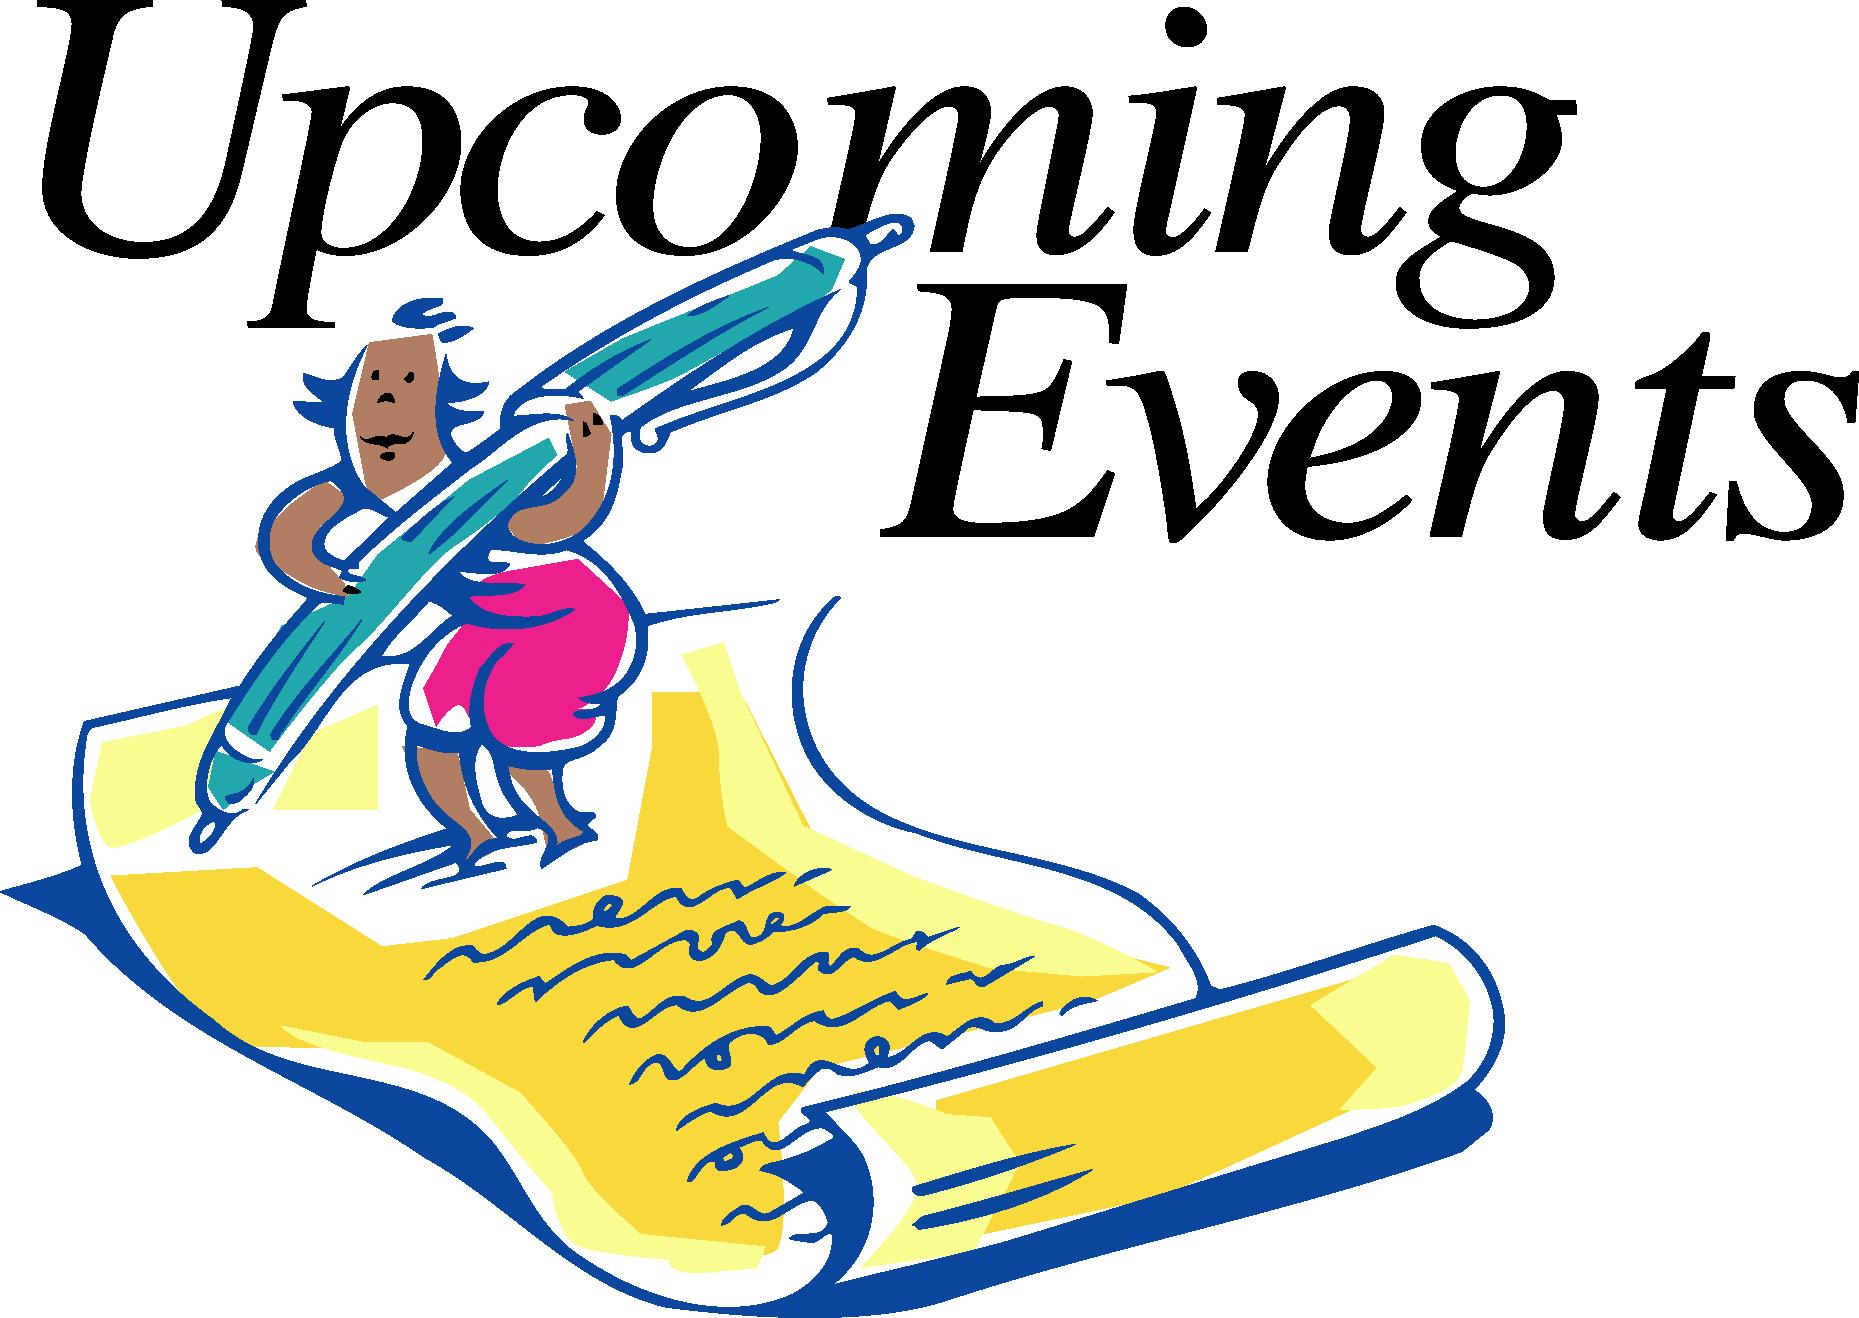 1859x1318 Upcoming Events Clip Art Clipart